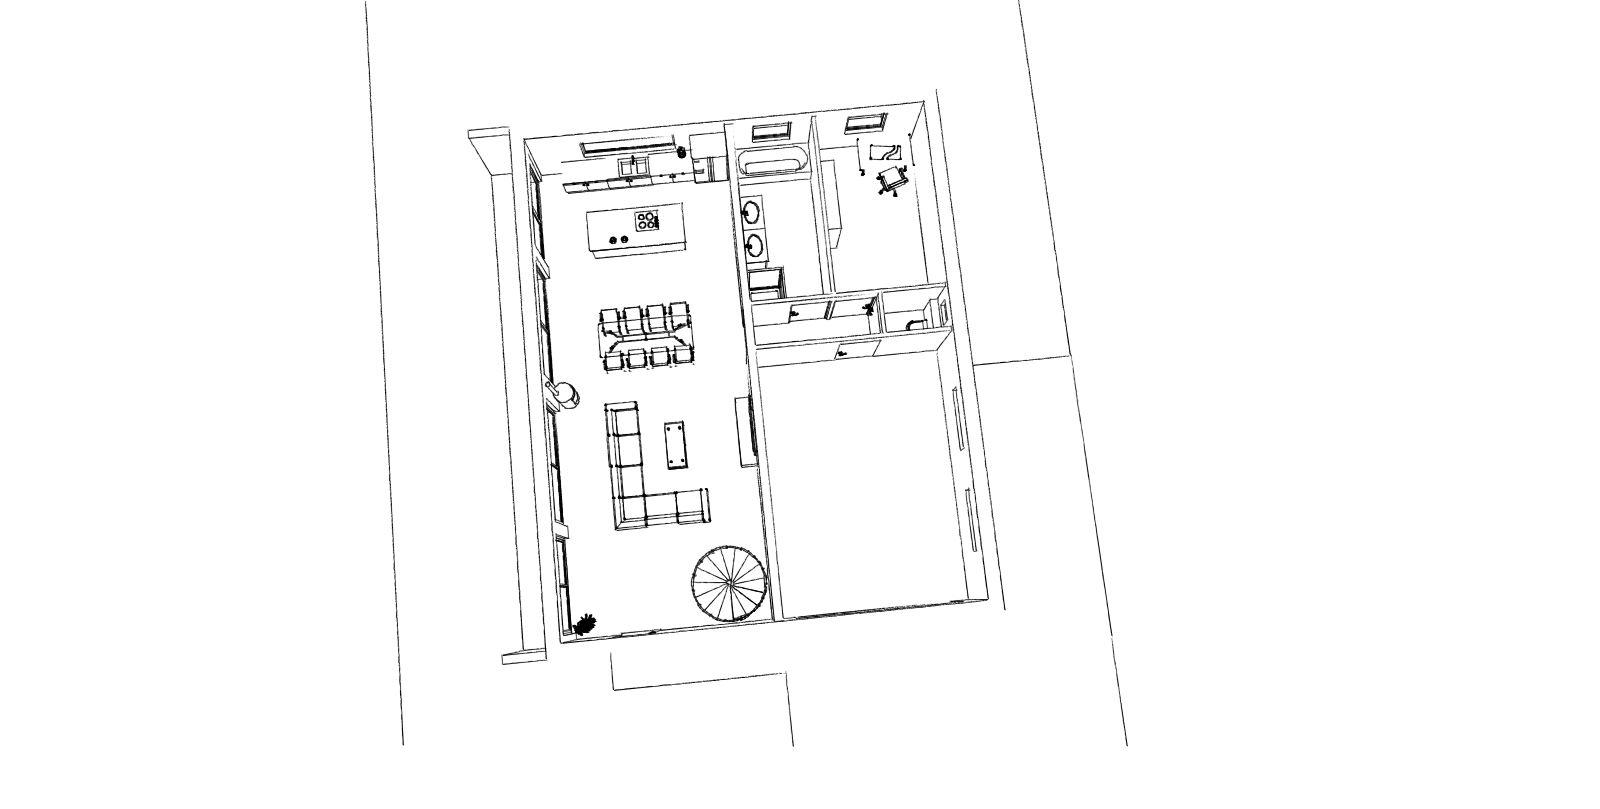 15.17 Permis de construire maison nord Thun Saint Amand2